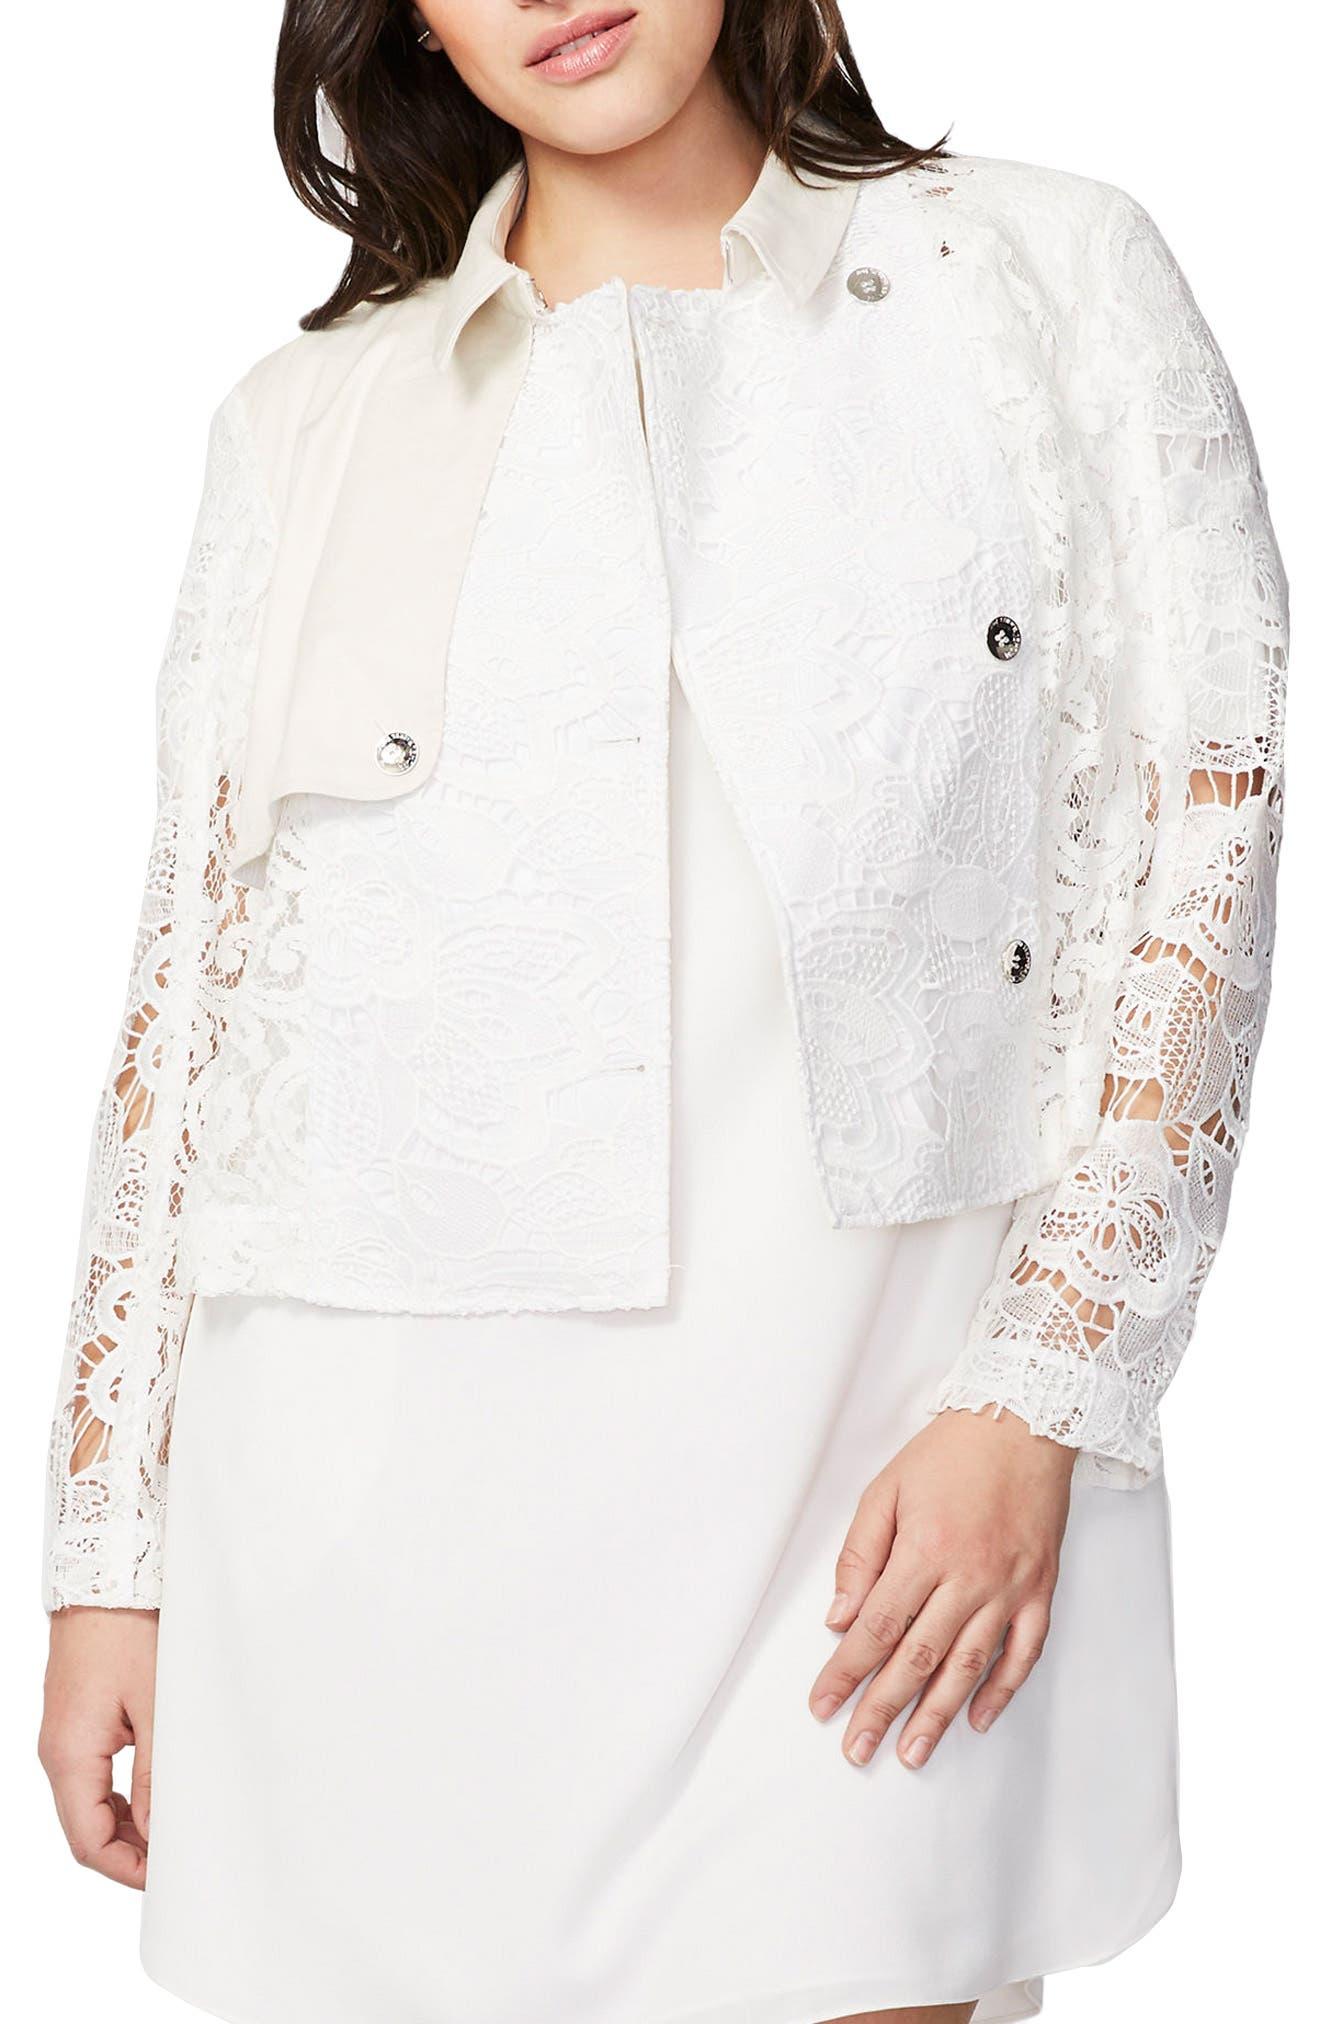 Rachel Roy Crop Lace Trench Jacket,                             Main thumbnail 1, color,                             100